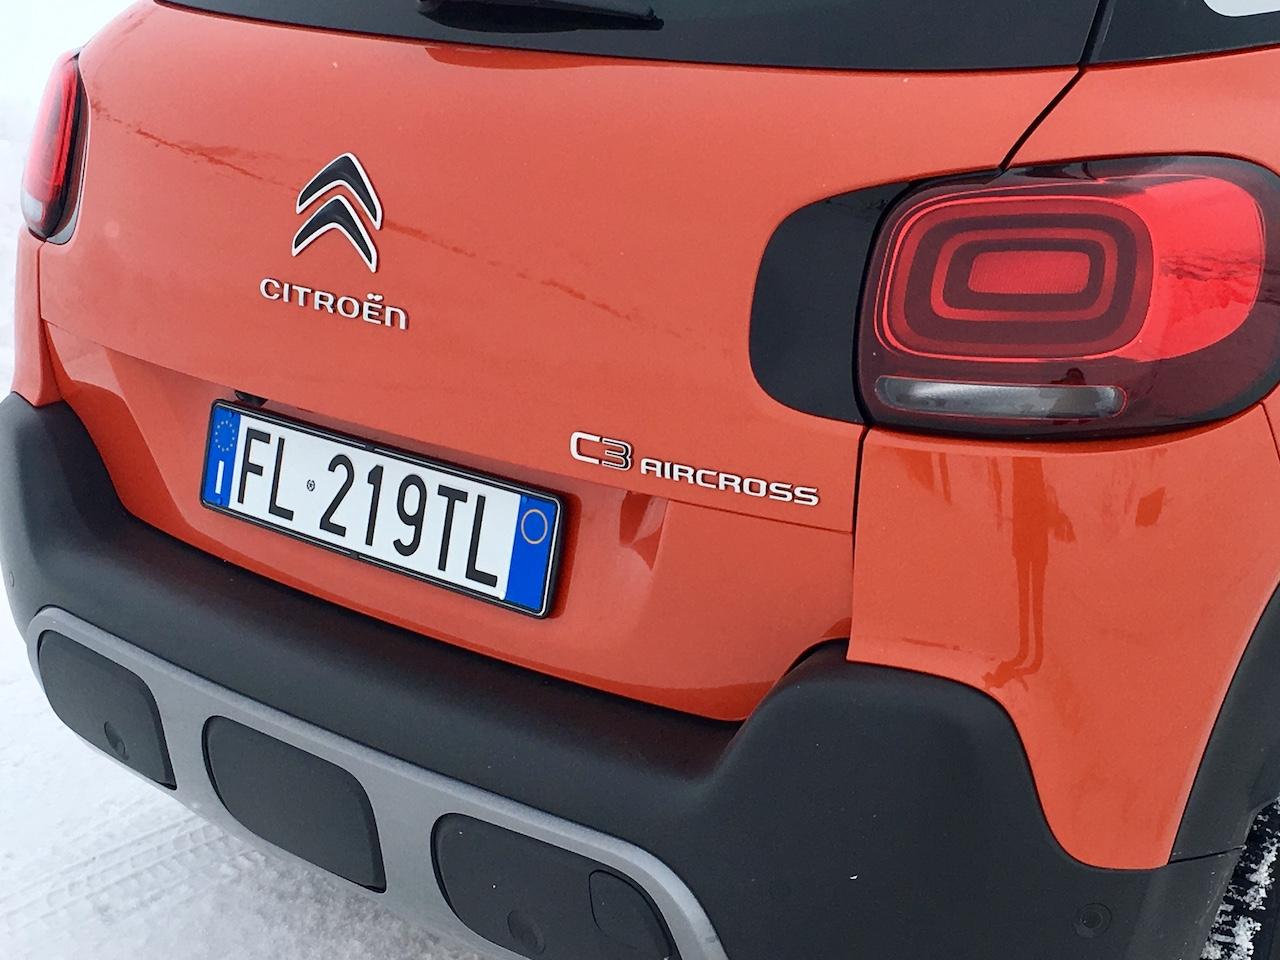 Nuova Citroen C3 Aircross